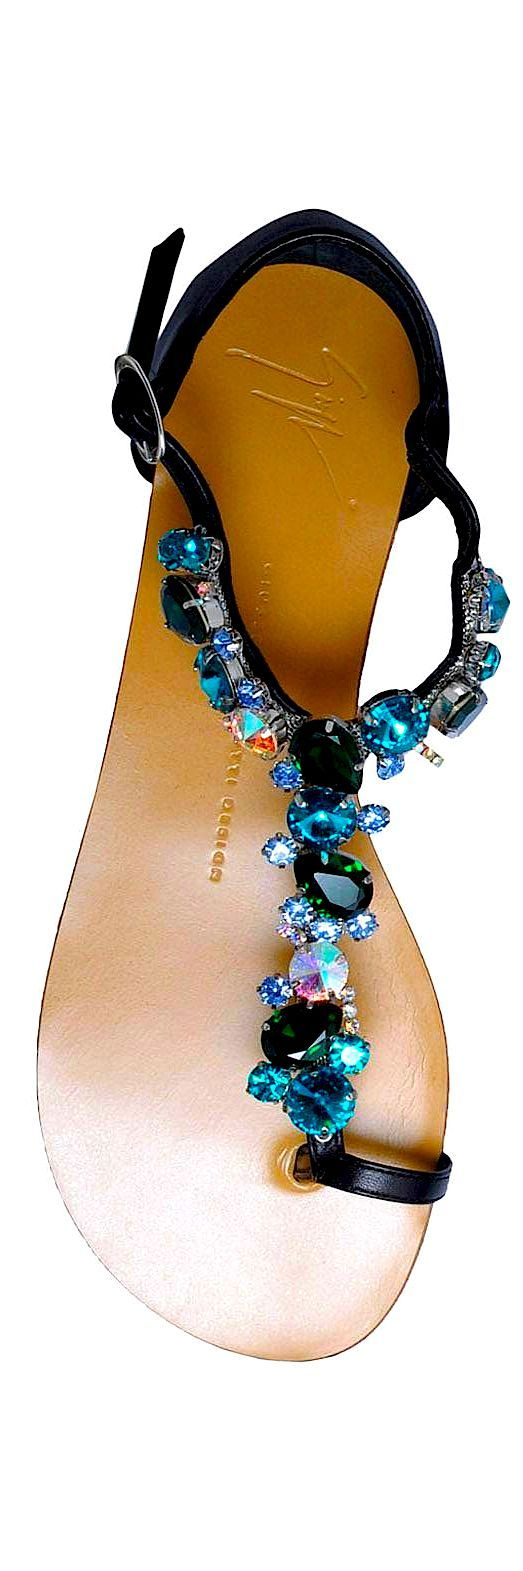 Tendance Chaussures  Giuseppe Zanotti  for lower prices order online through Cheap.org  Tendance & idée Chaussures Femme 2016/2017 Description Giuseppe Zanotti @}--;